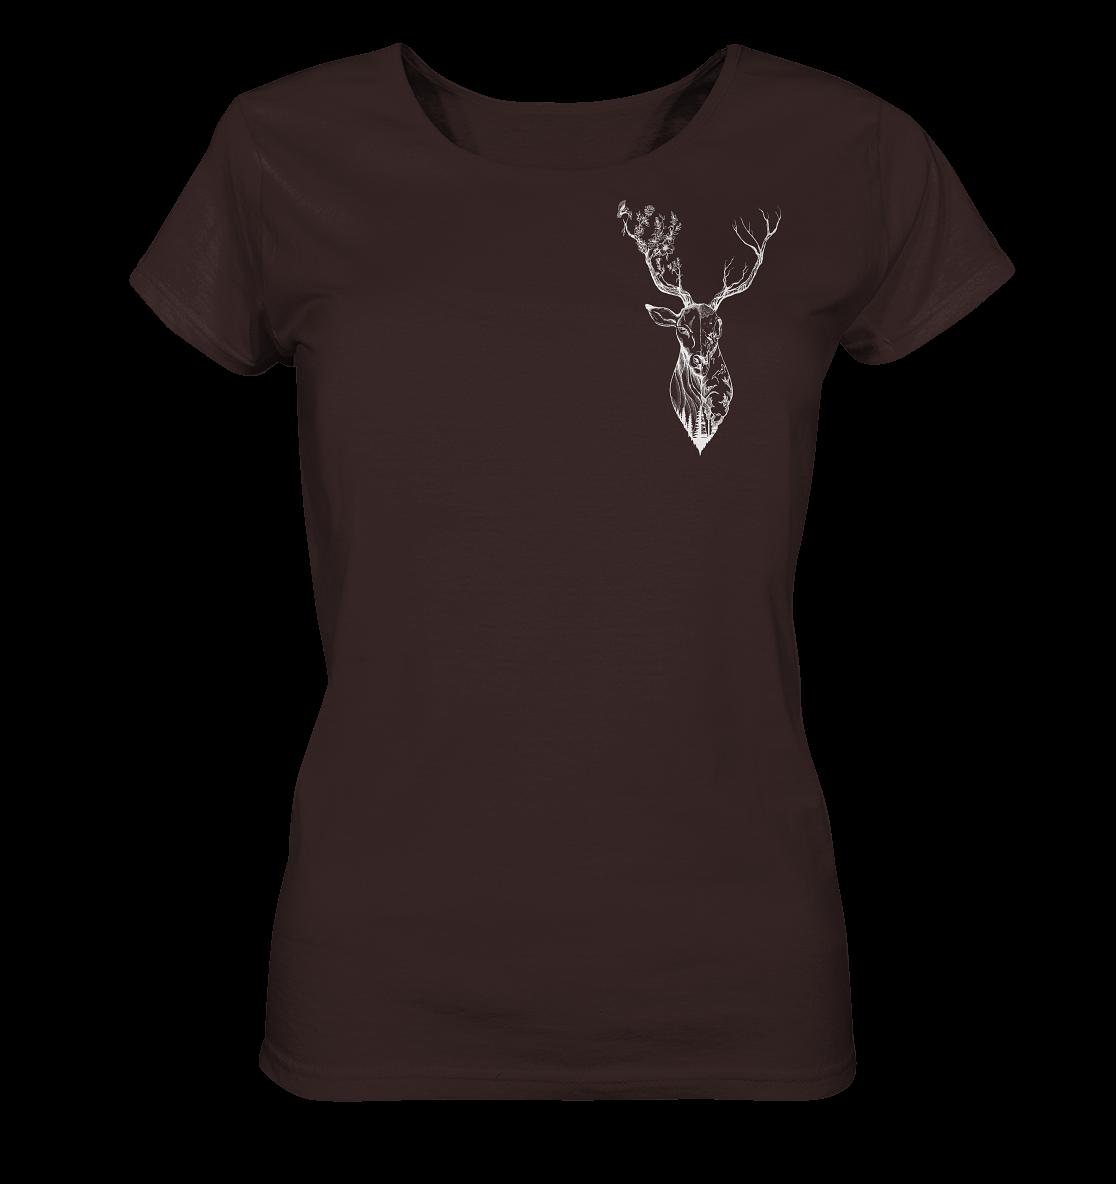 front-ladies-organic-shirt-372726-1116x-6.png